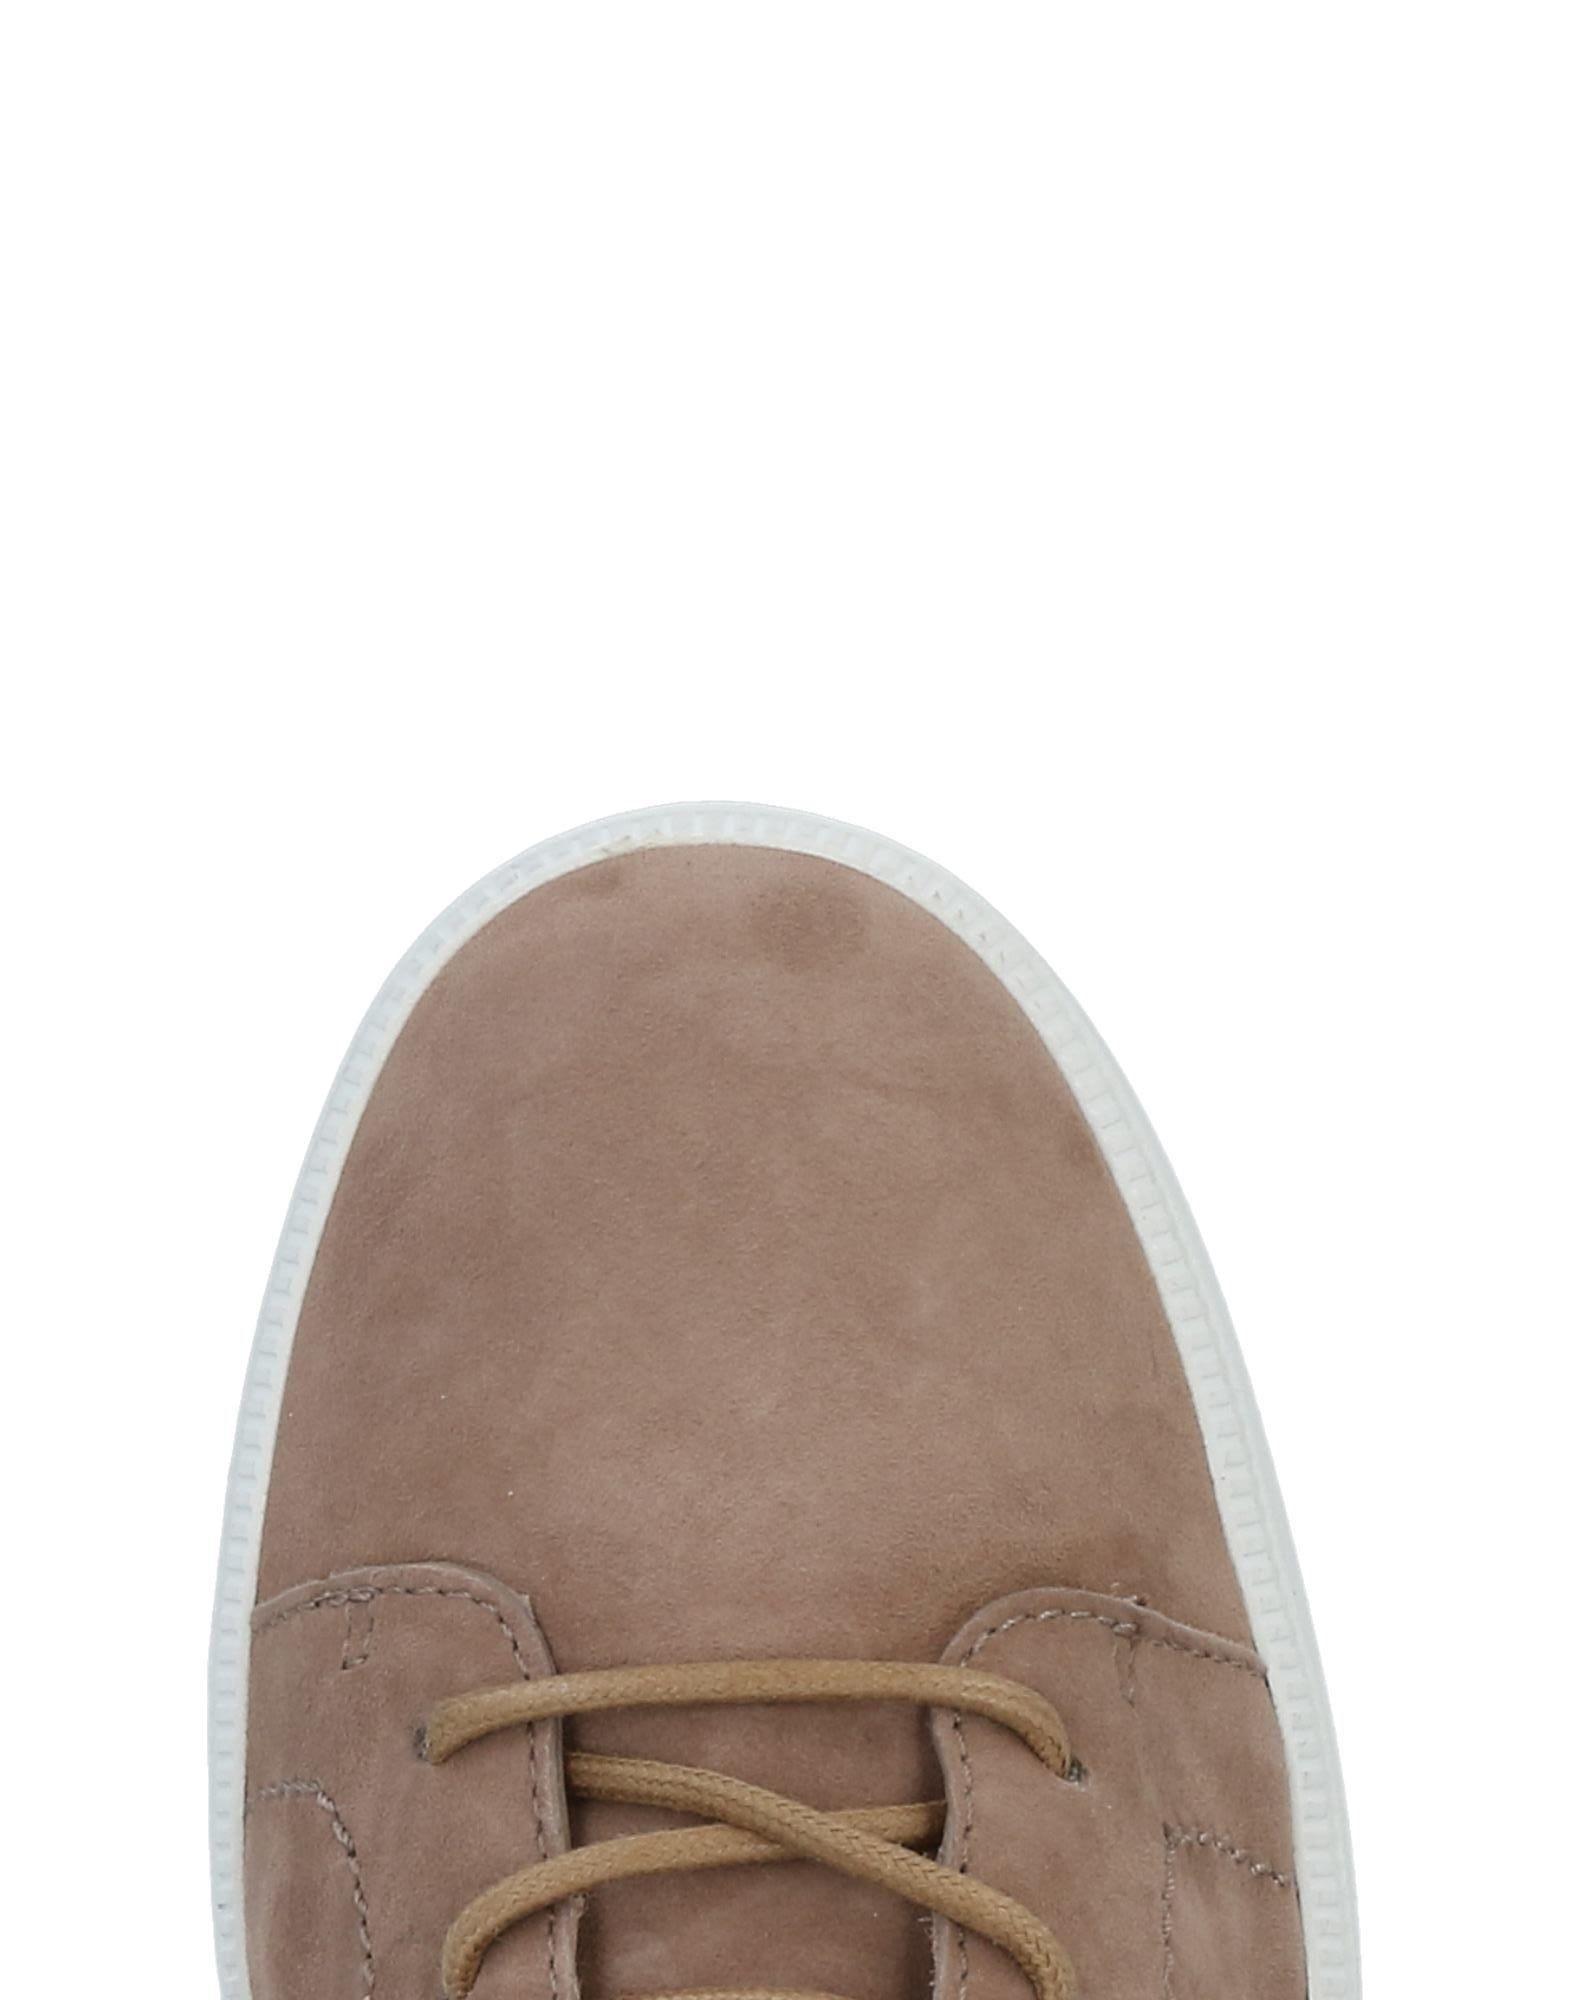 Giuseppe Zanotti Gute Sneakers Herren  11447378IT Gute Zanotti Qualität beliebte Schuhe 285eb4